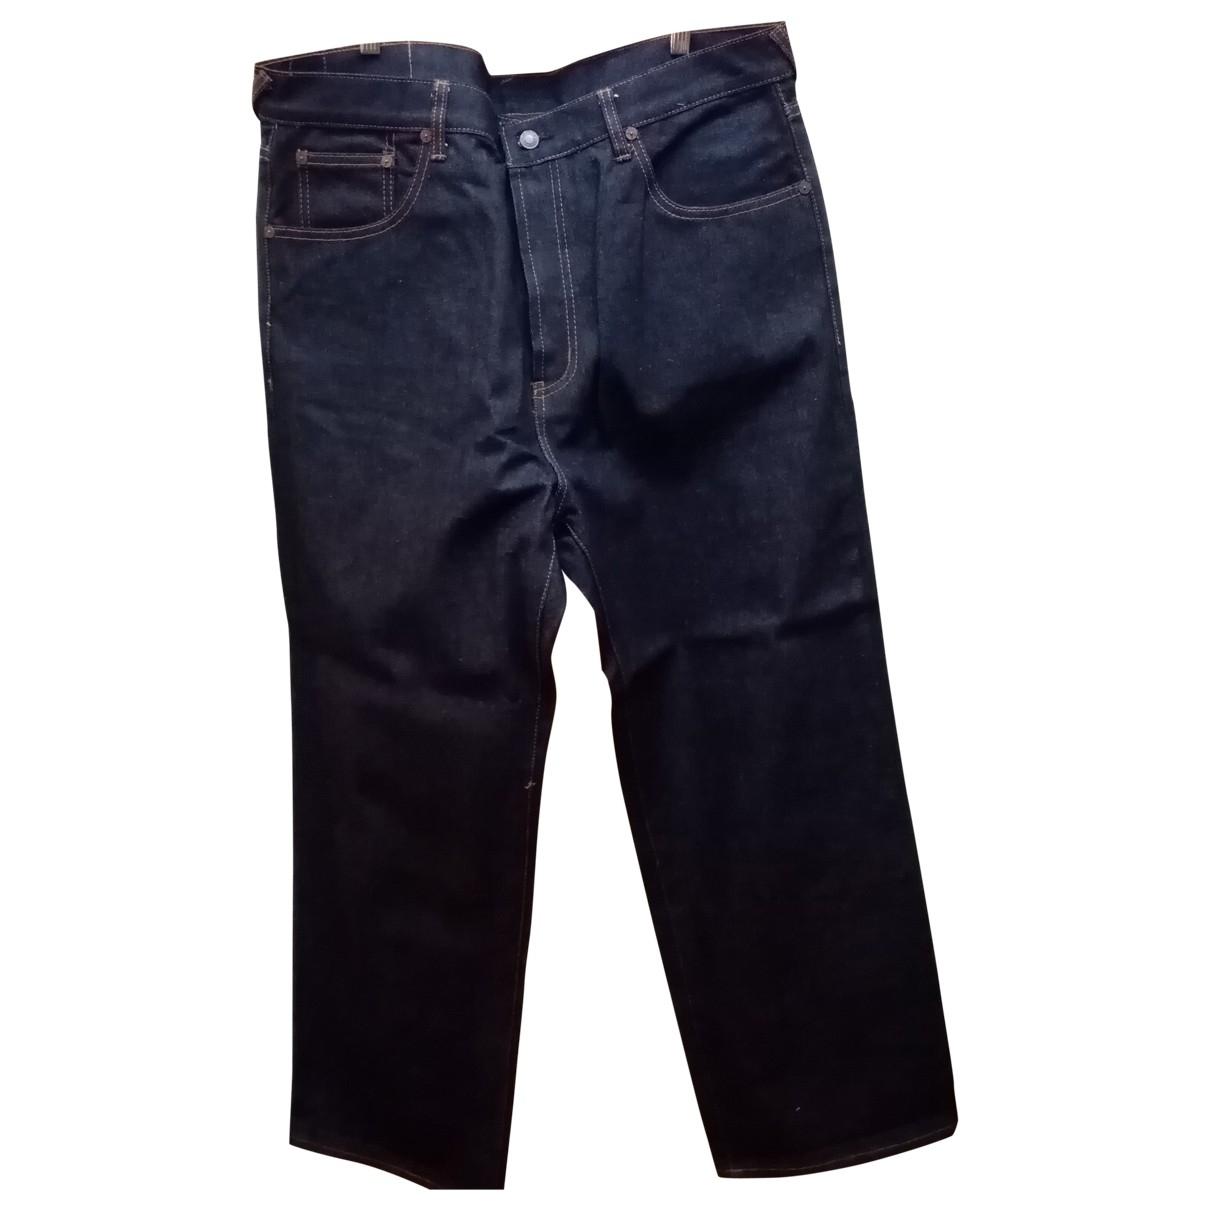 Evisu \N Navy Cotton Jeans for Men 36 US